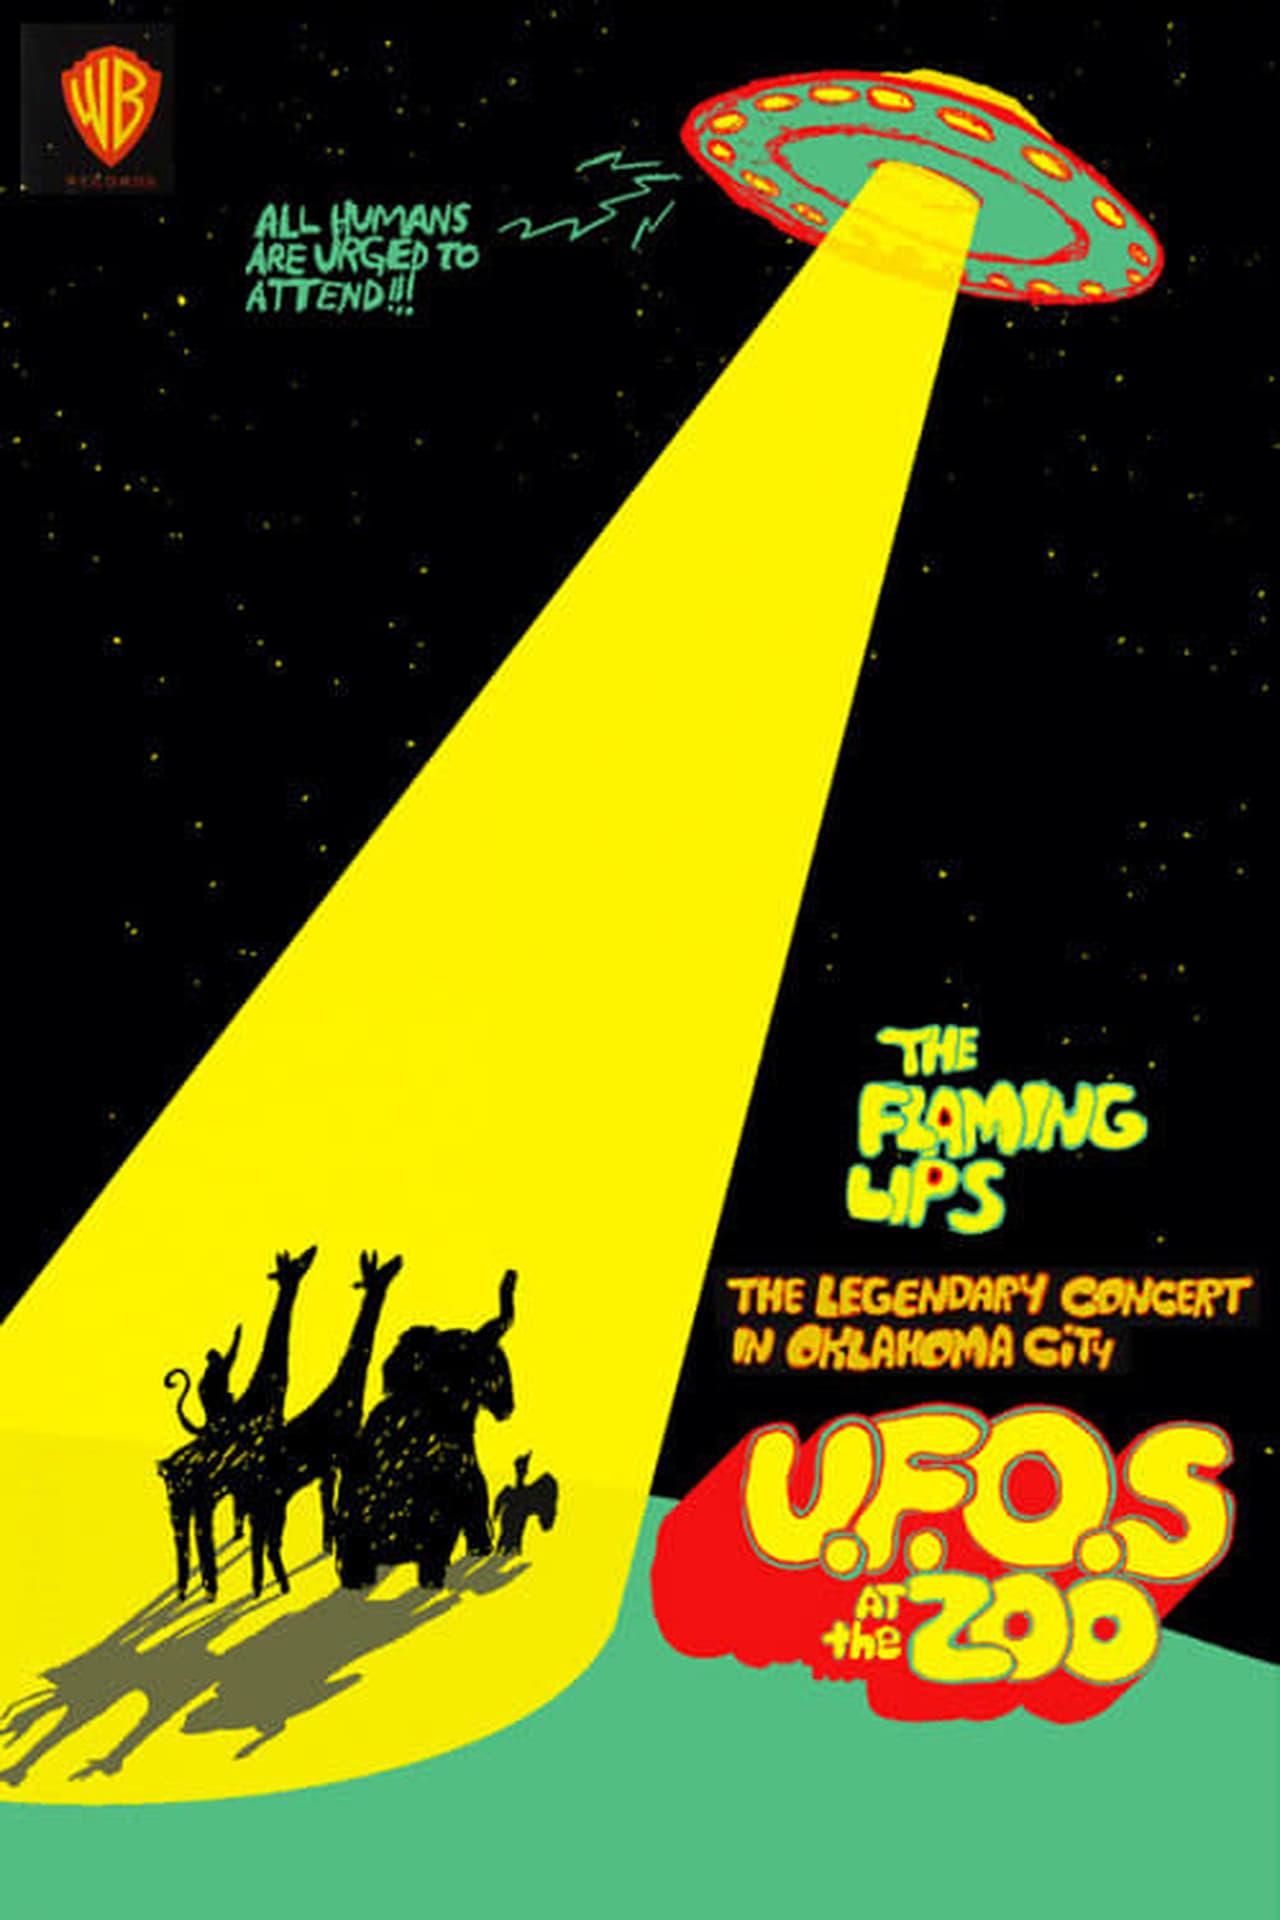 The Flaming Lips: U.F.O's At The Zoo (2007)